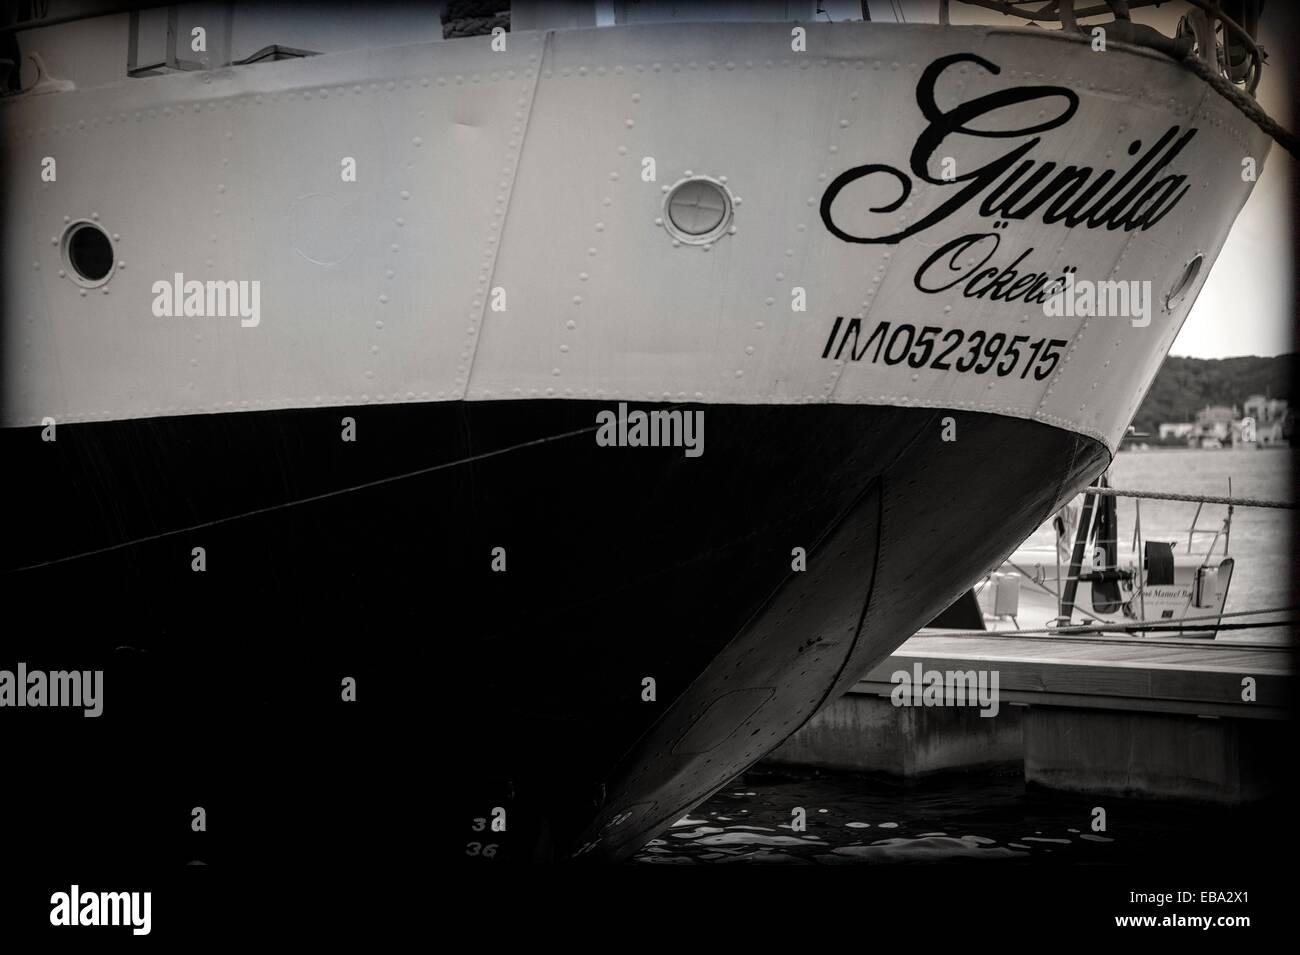 1941 65-70 aventura antiguo Aventura bachillerato detrás del barco blanco y negro Casco clasico concepto clásico detras educacion Foto de stock